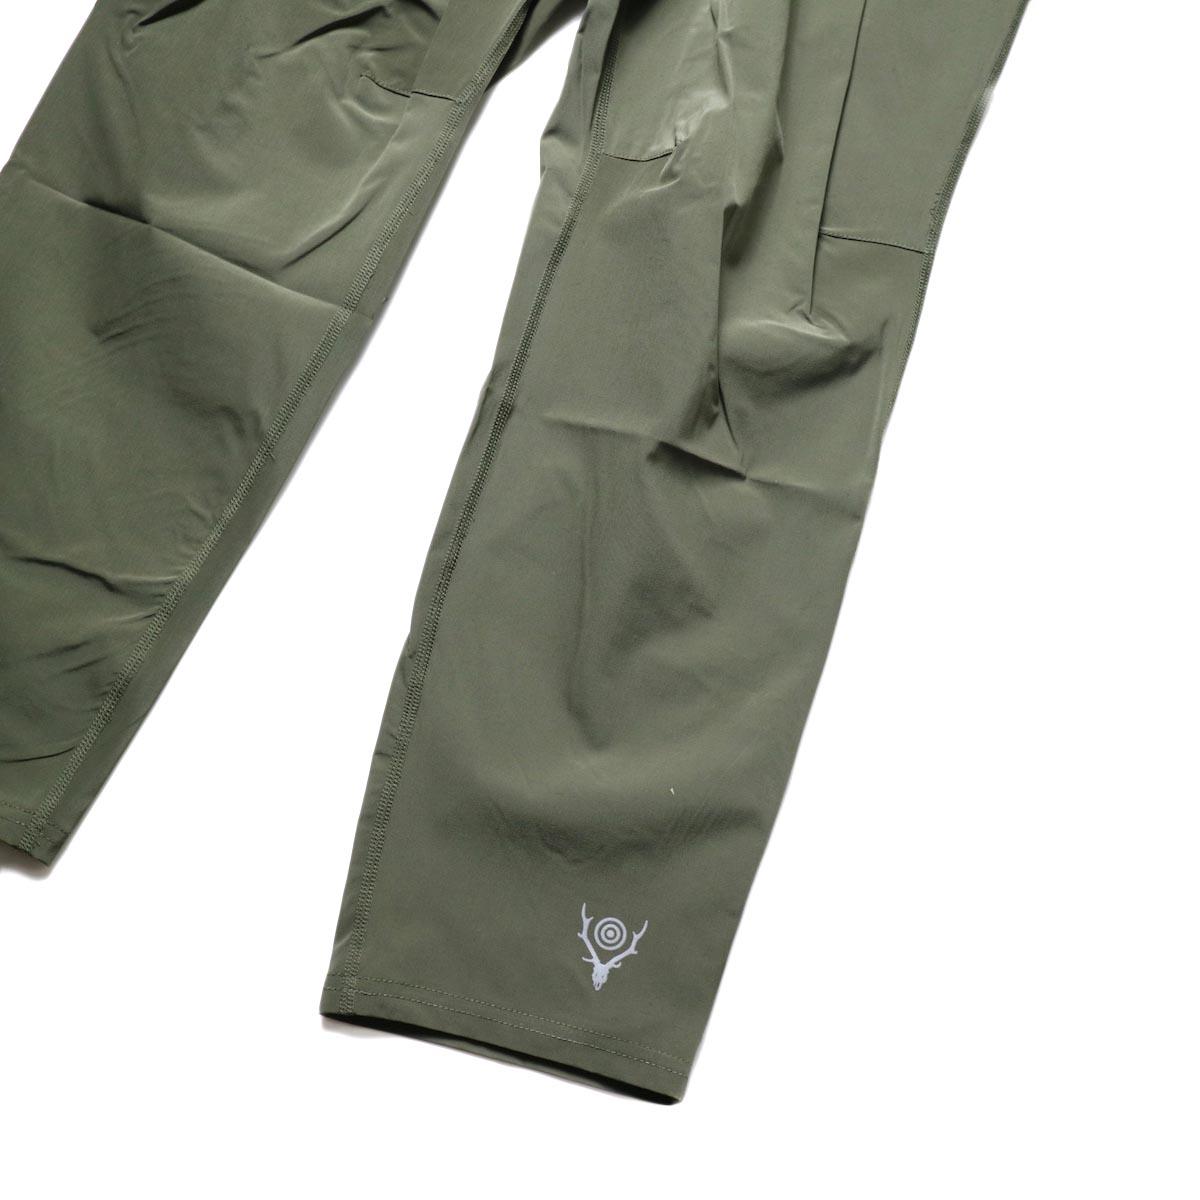 South2 West8 / 2P Cycle Pant -N/Pu Taffeta (Olive)裾、ロゴ